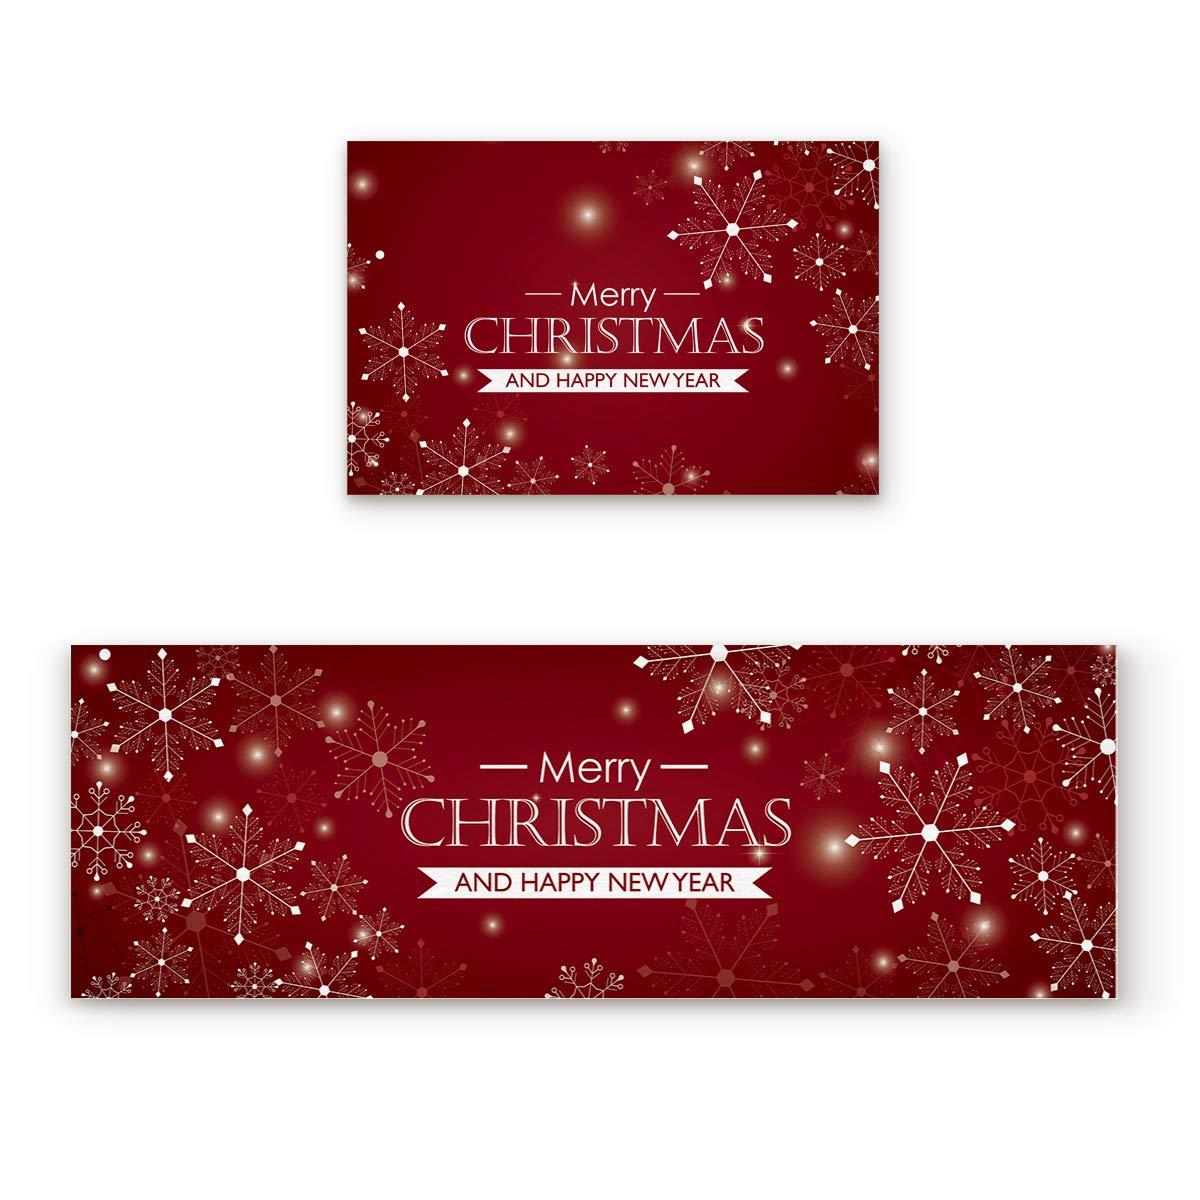 Shine-Home 滑り止めキッチンマット ゴム裏地 ドアマット ランナーラグセット キッズエリアラグ カーペット ベッドルームラグ メリークリスマス 新年おめでとう スノーフレーク レッド エレメント背景 2枚 23.6''W by 35.4''L + 23.6''W by 70.9''L 181009zly2pcsmatKC-SCRY00655MDDDSHO 23.6''W by 35.4''L + 23.6''W by 70.9''L Christmas-012 B07JVVLKQK